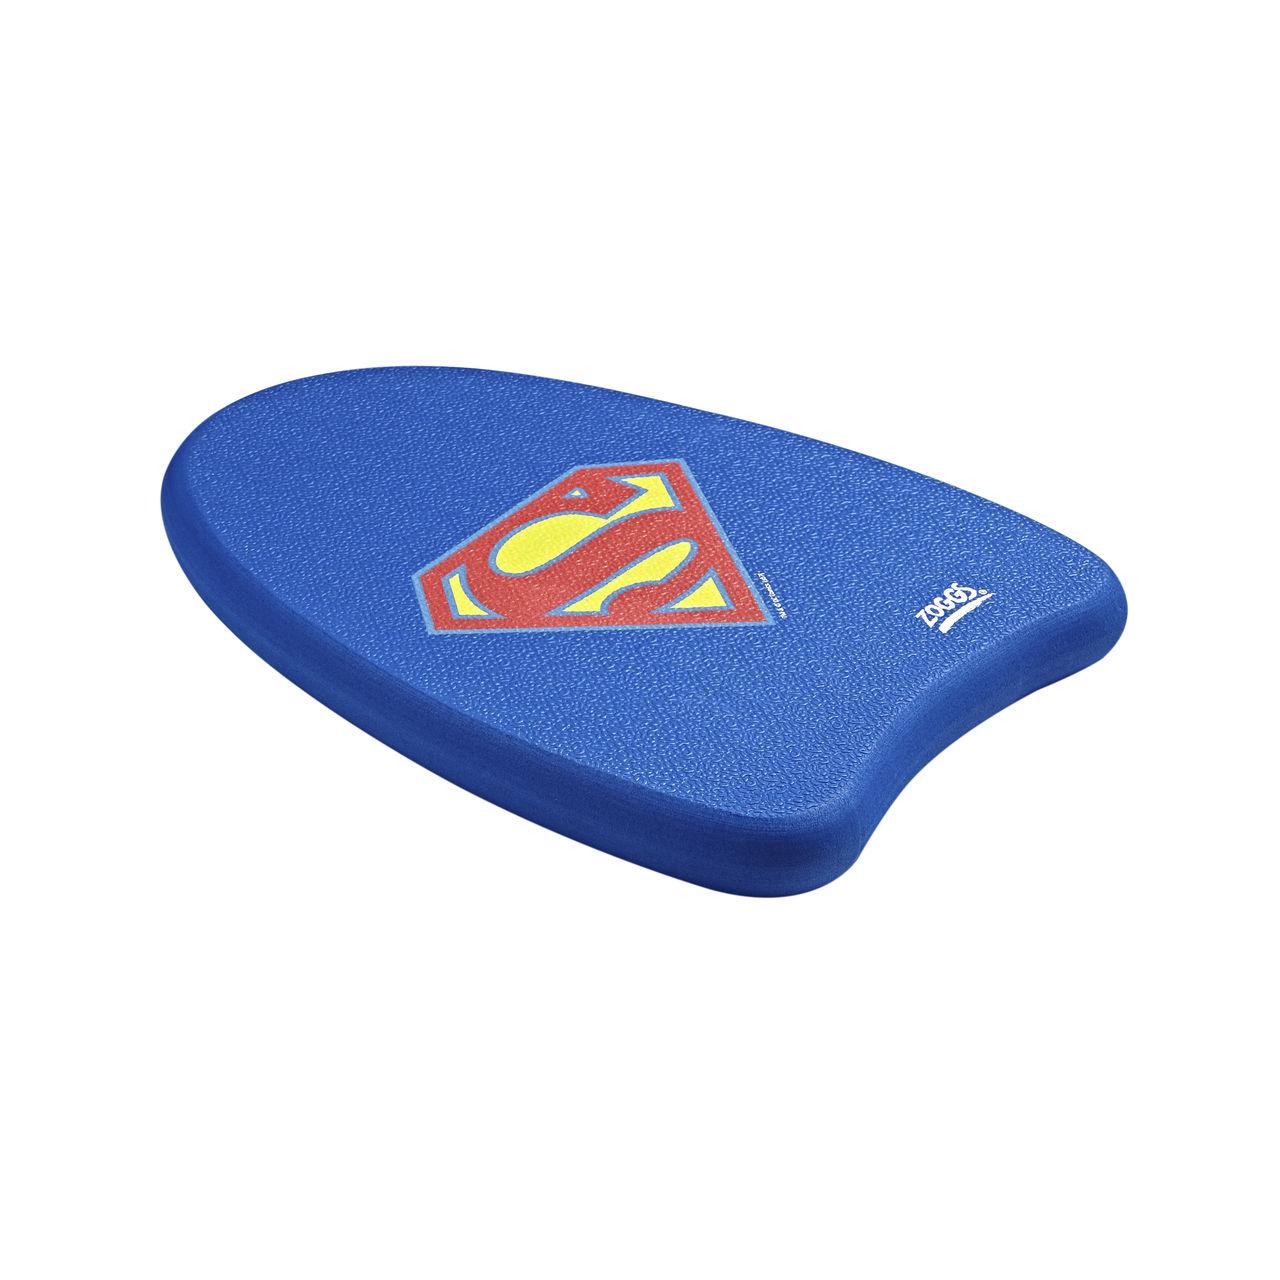 382404_SUPERMAN_KICK_BOARD_24